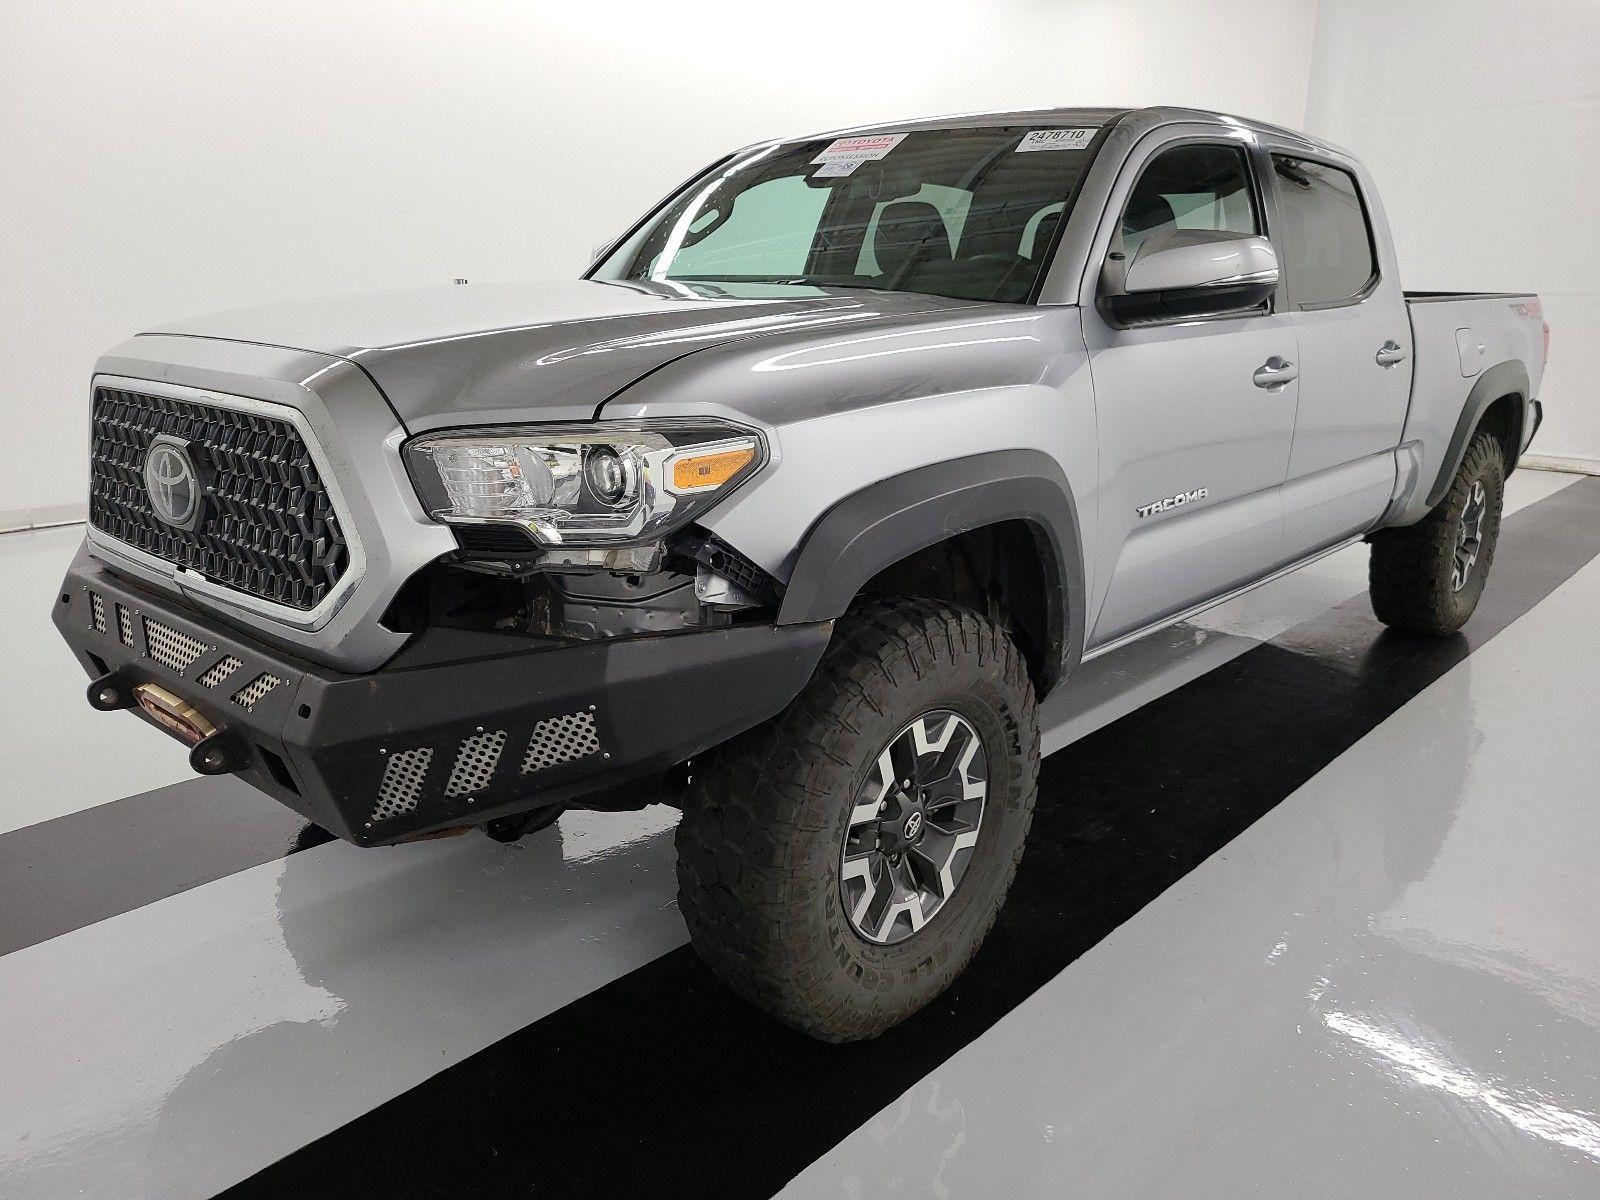 2018 Toyota Tacoma 3.5. Lot 99912948481 Vin 3TMDZ5BN5JM047424